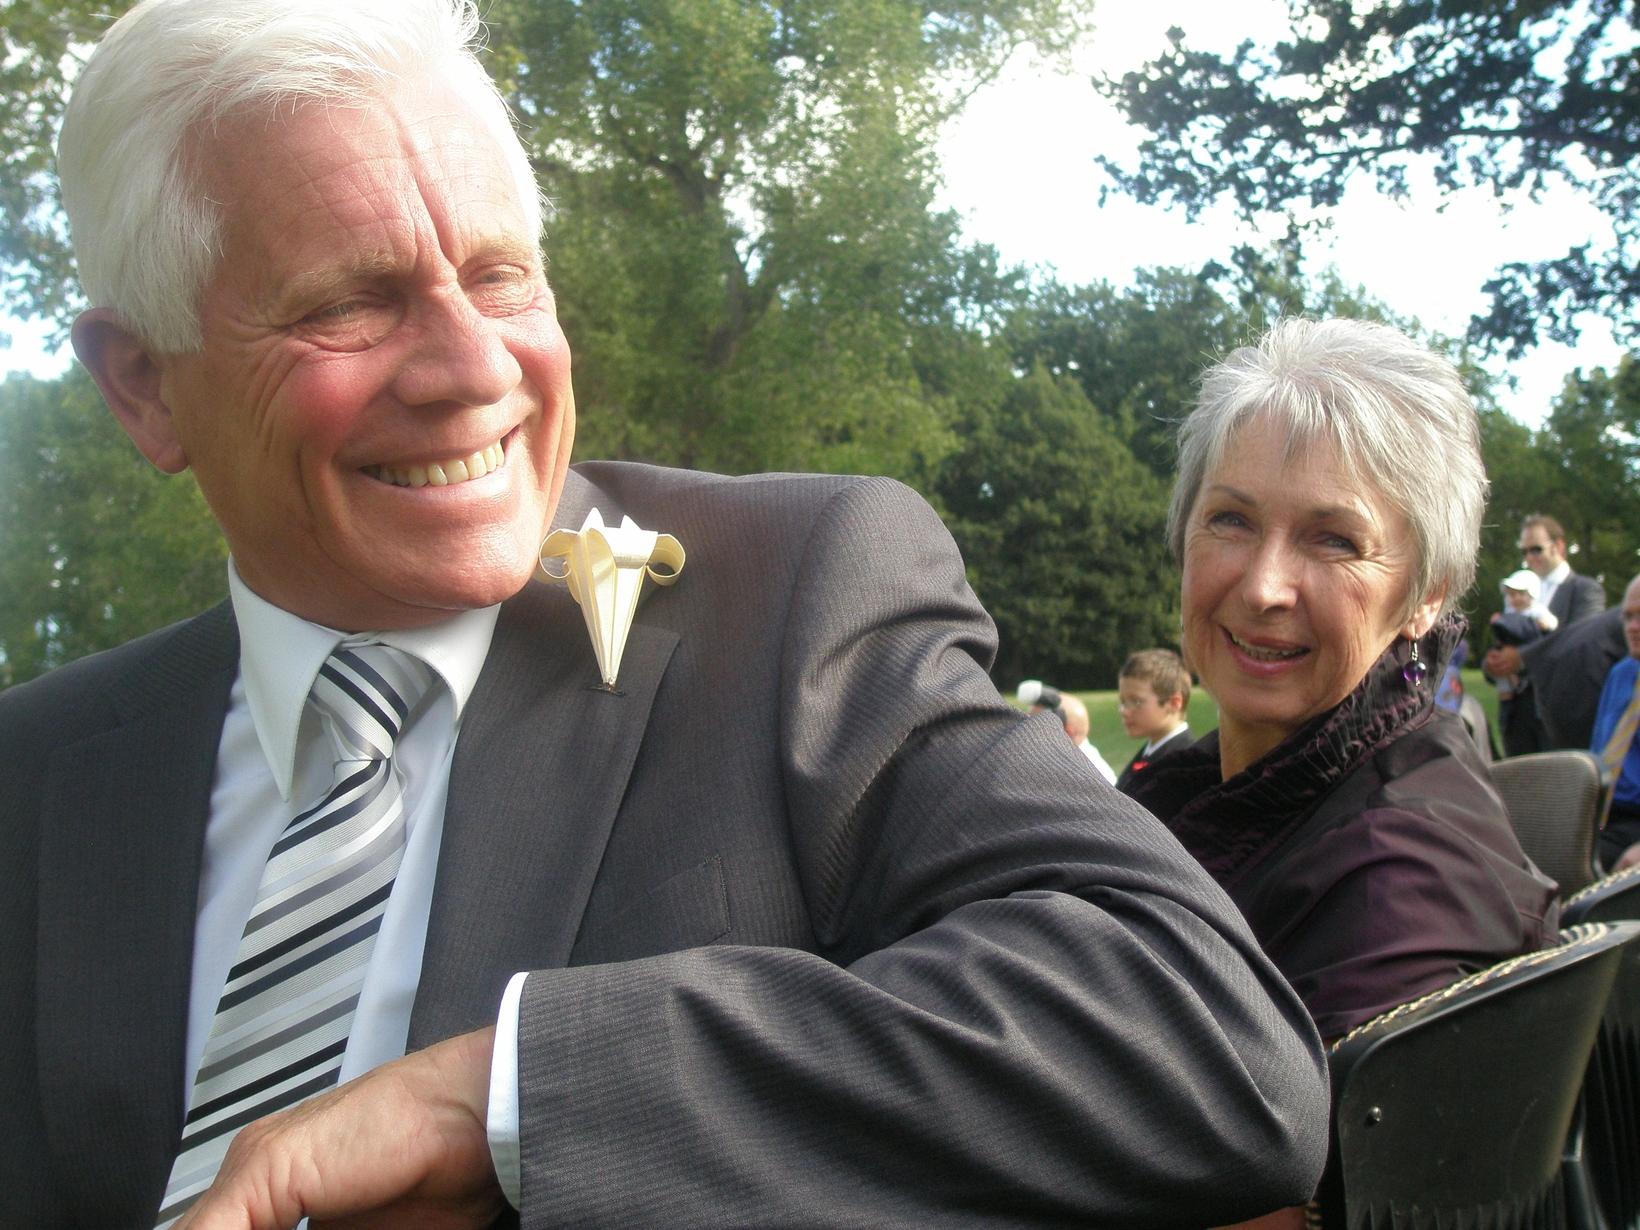 Susan & Dennis from Launceston, Tasmania, Australia